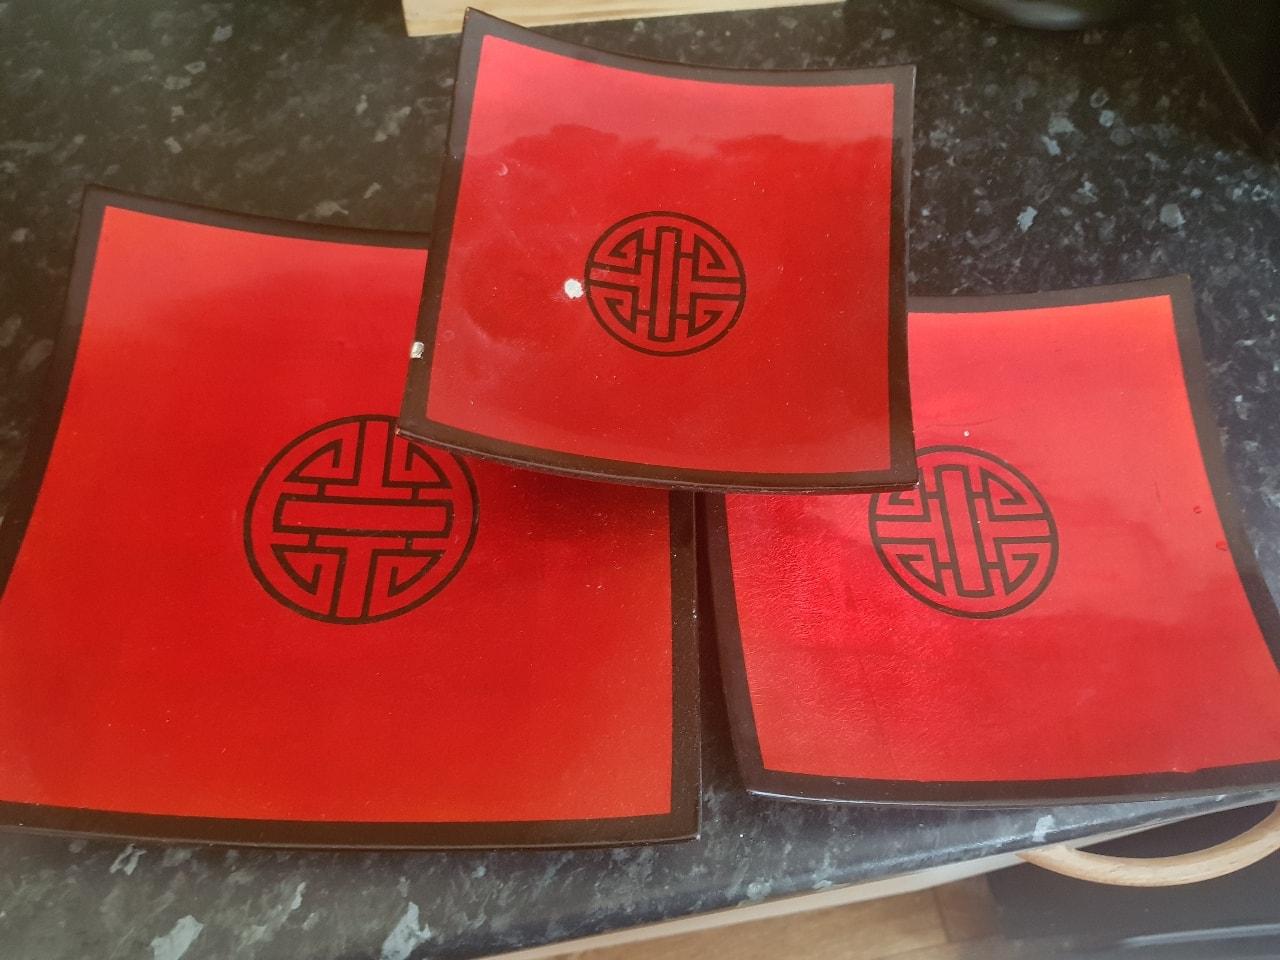 3 x bamboo plates